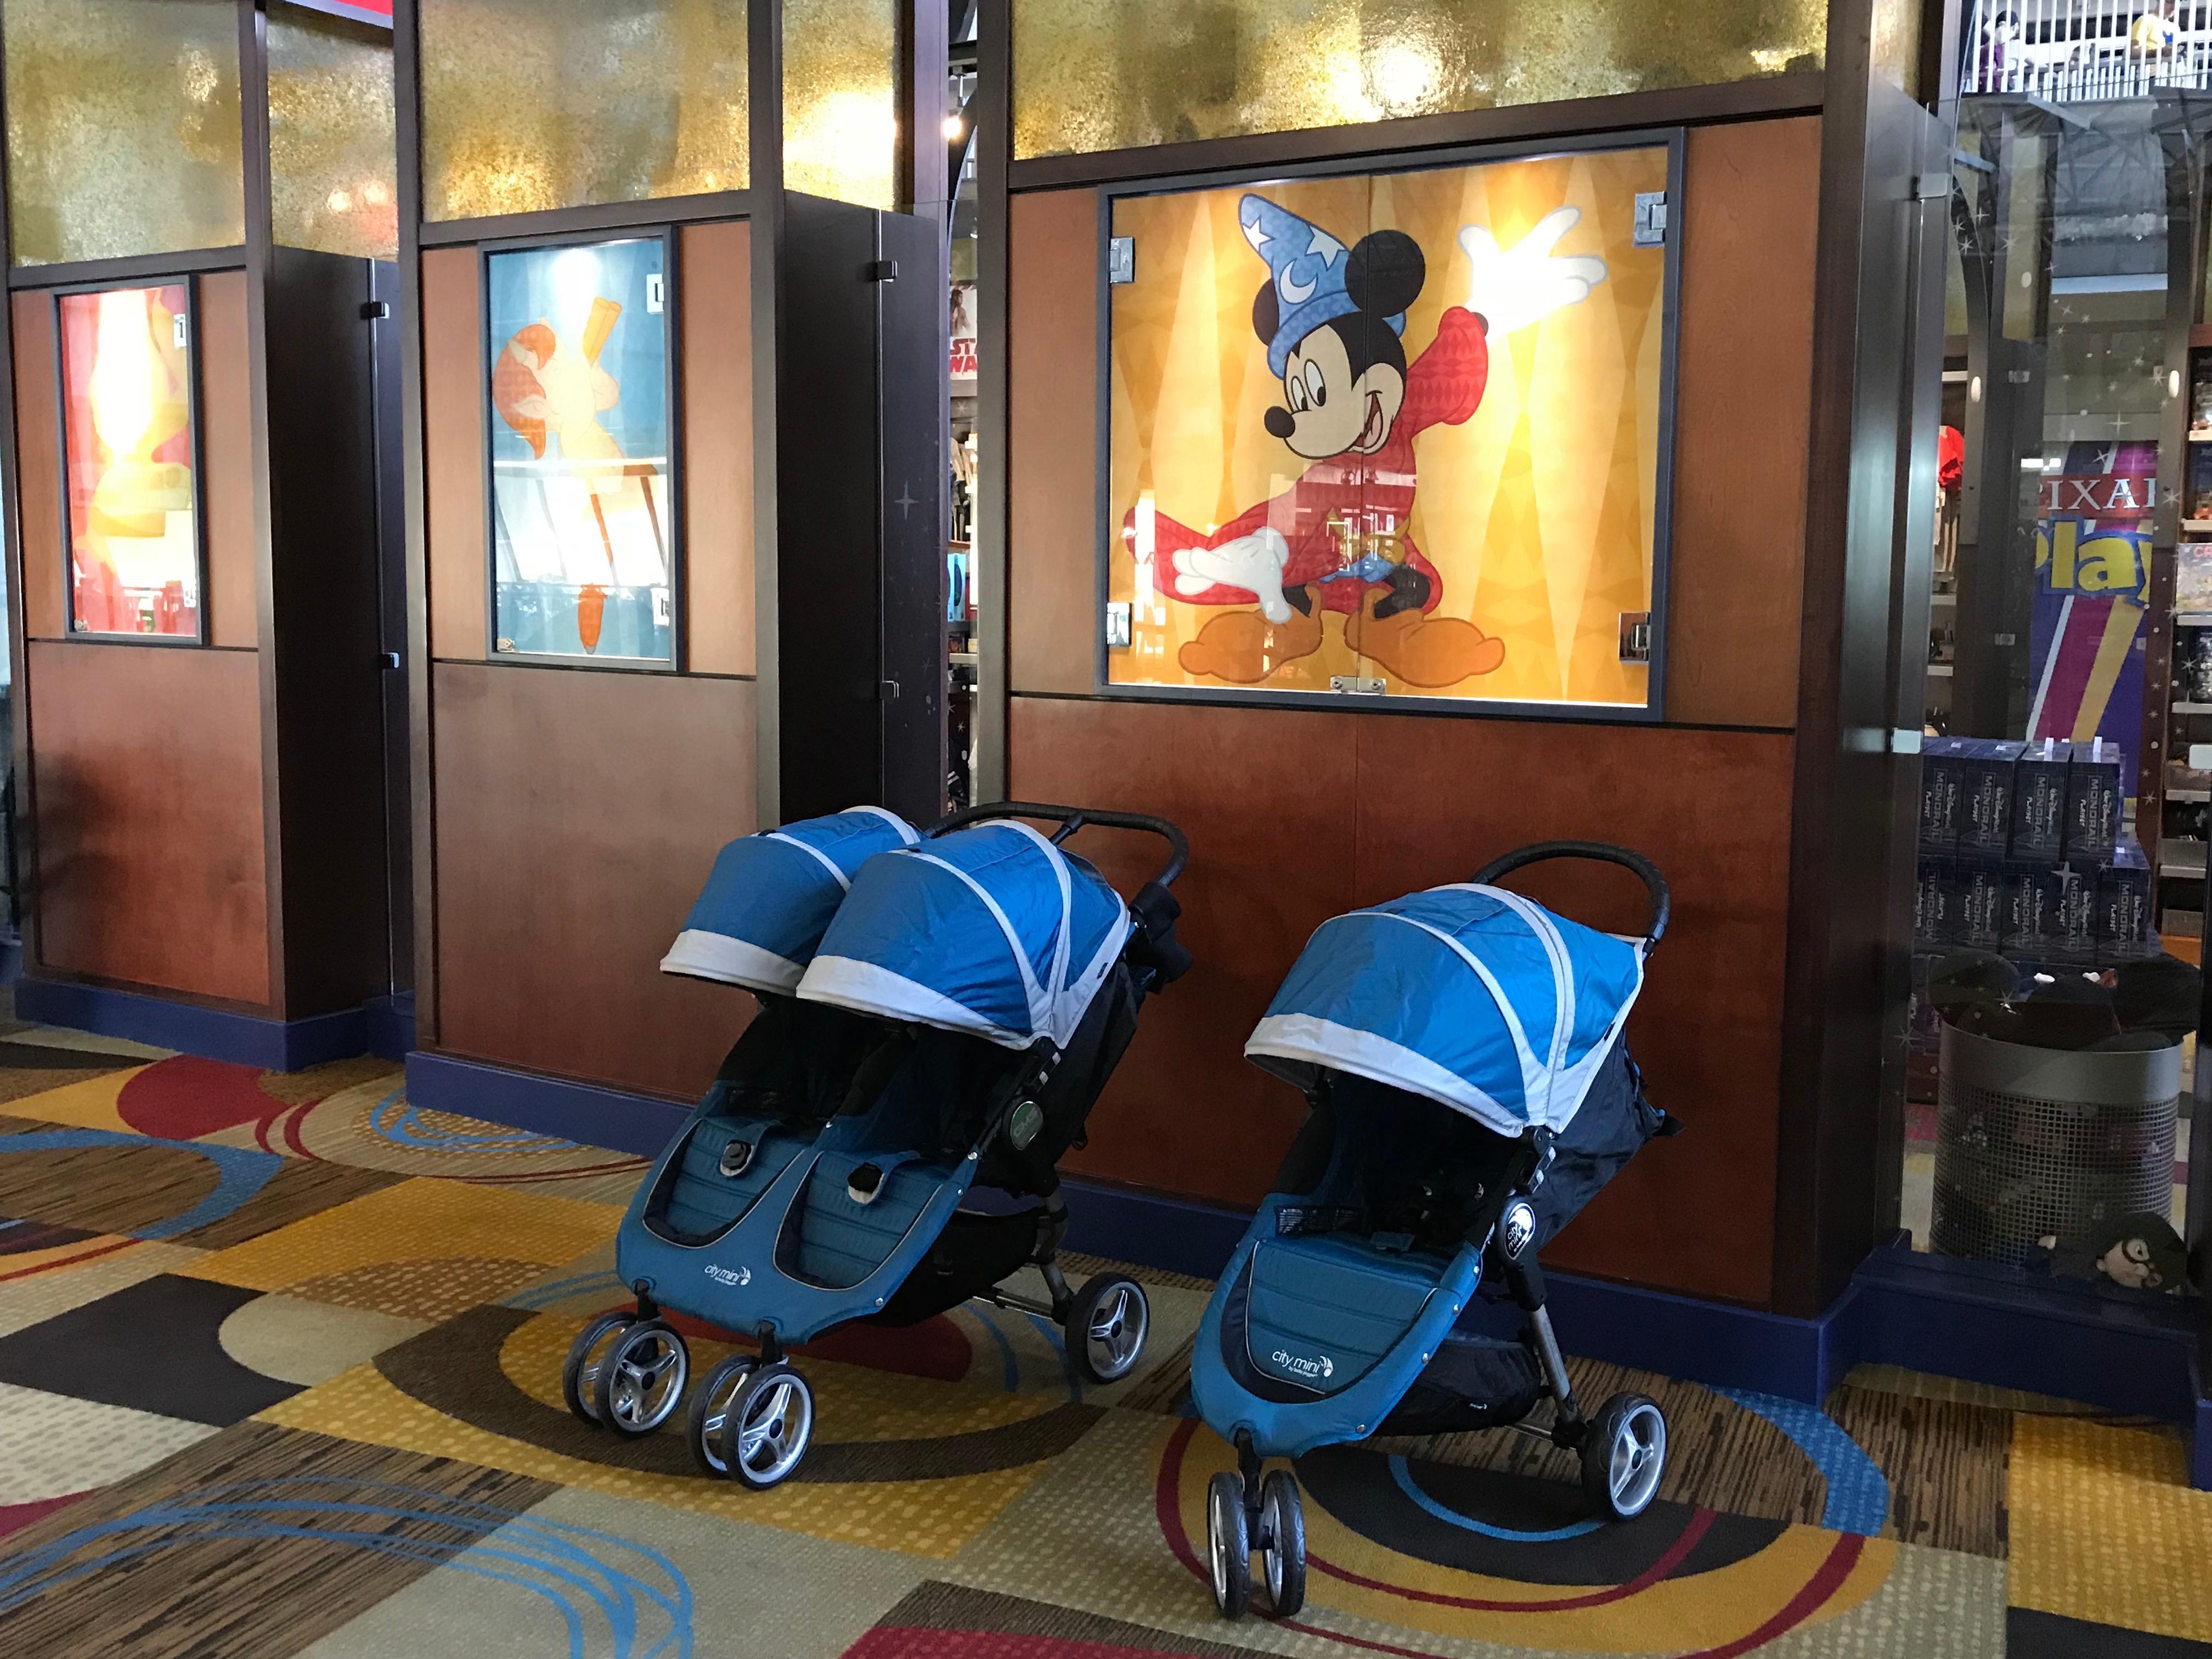 Stroller Rentals Disney image 82